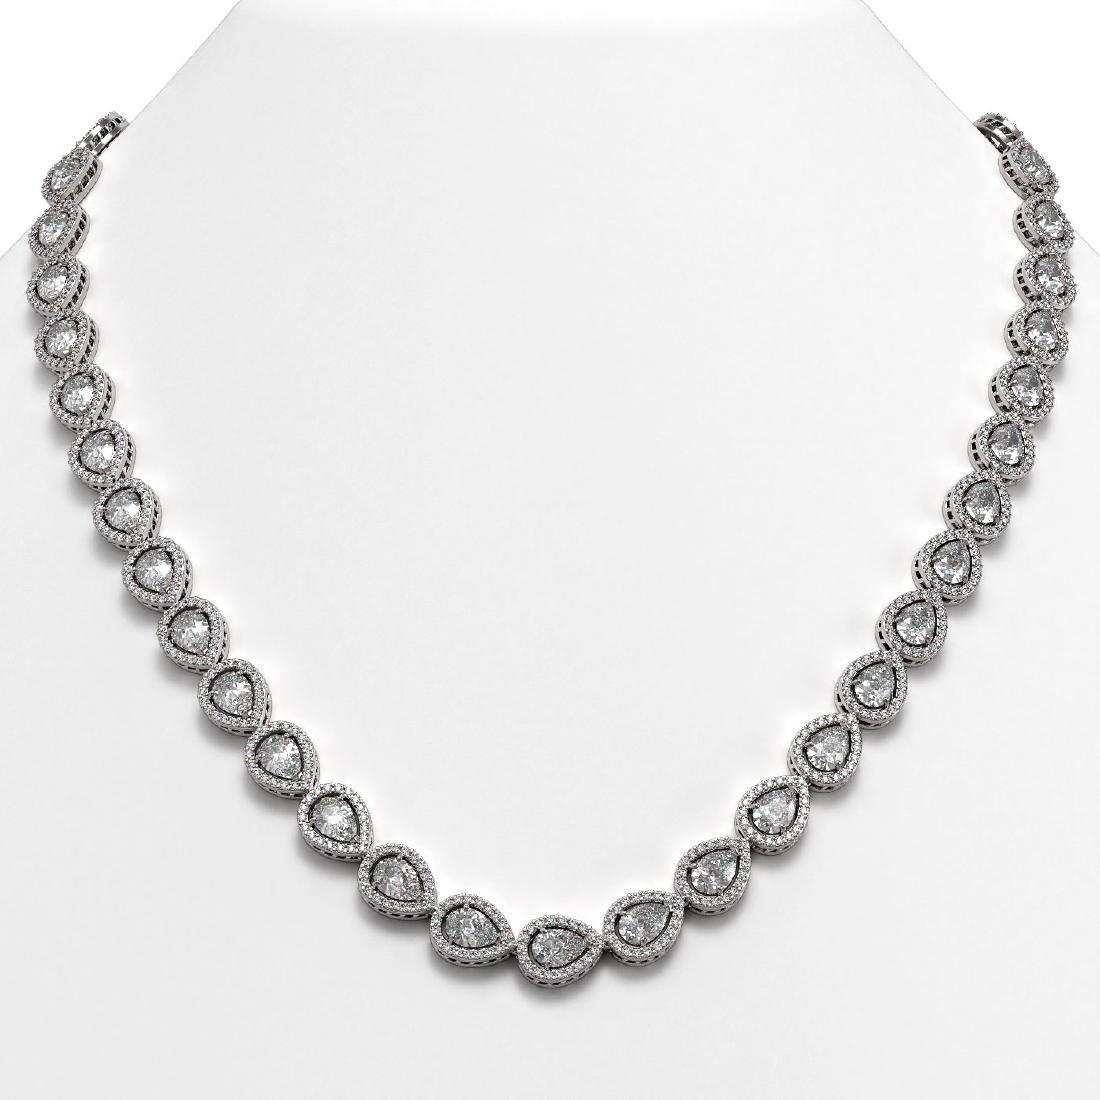 33.08 CTW Pear Diamond Designer Necklace 18K White Gold